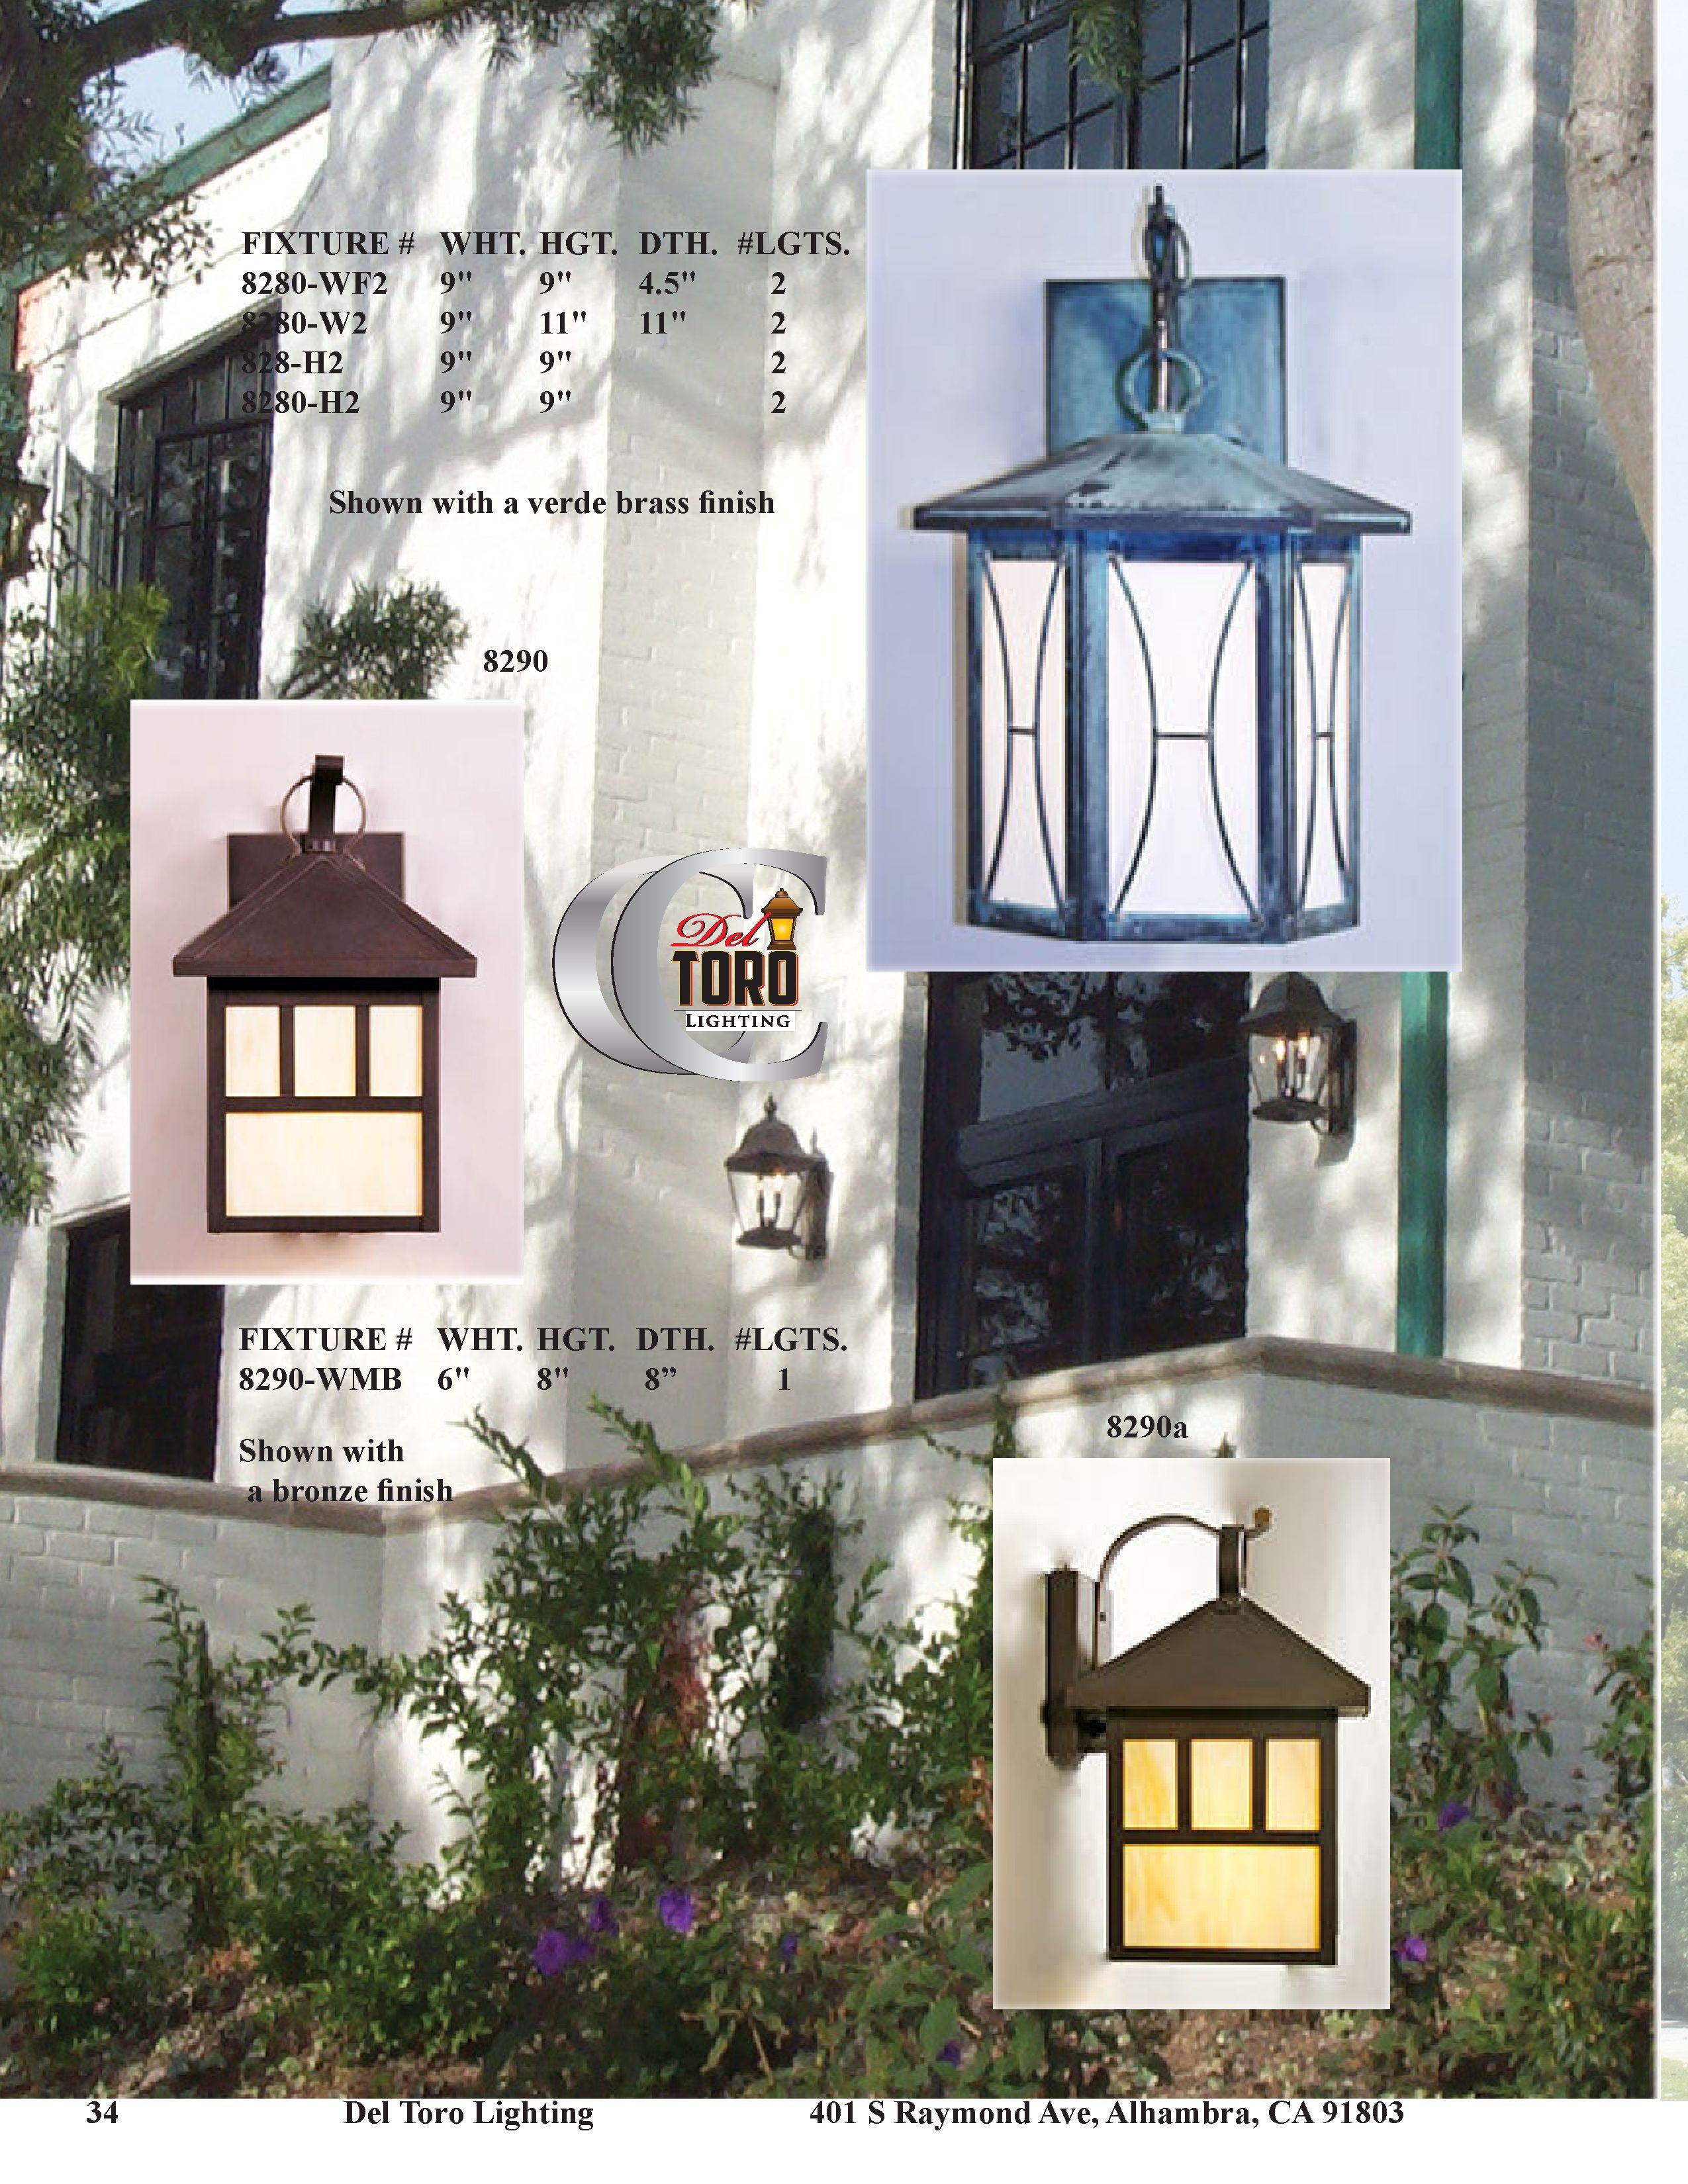 https://0201.nccdn.net/1_2/000/000/123/6ed/Del-Toro-2013-Catalog_34.jpg